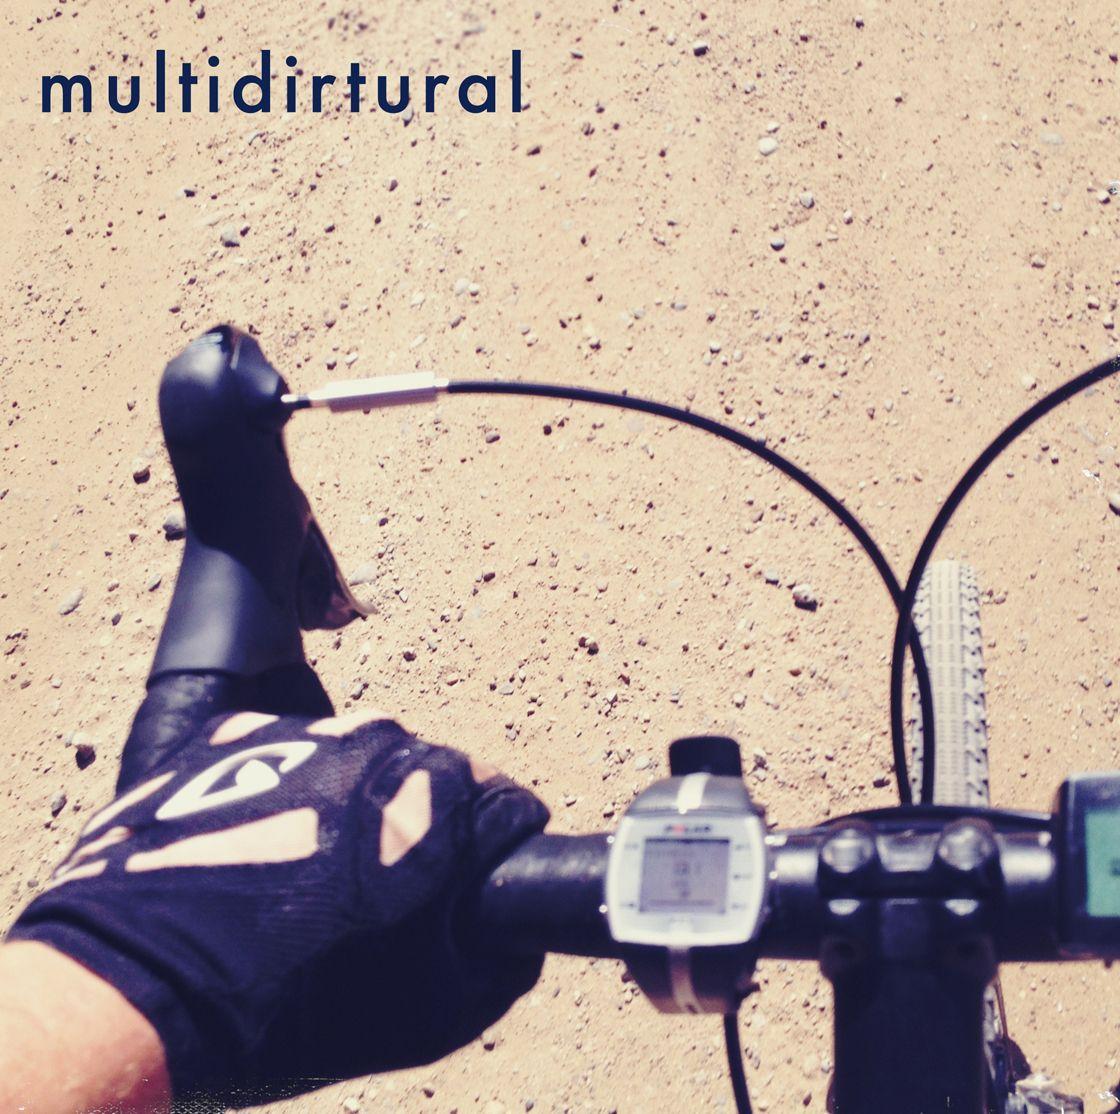 multidirtual